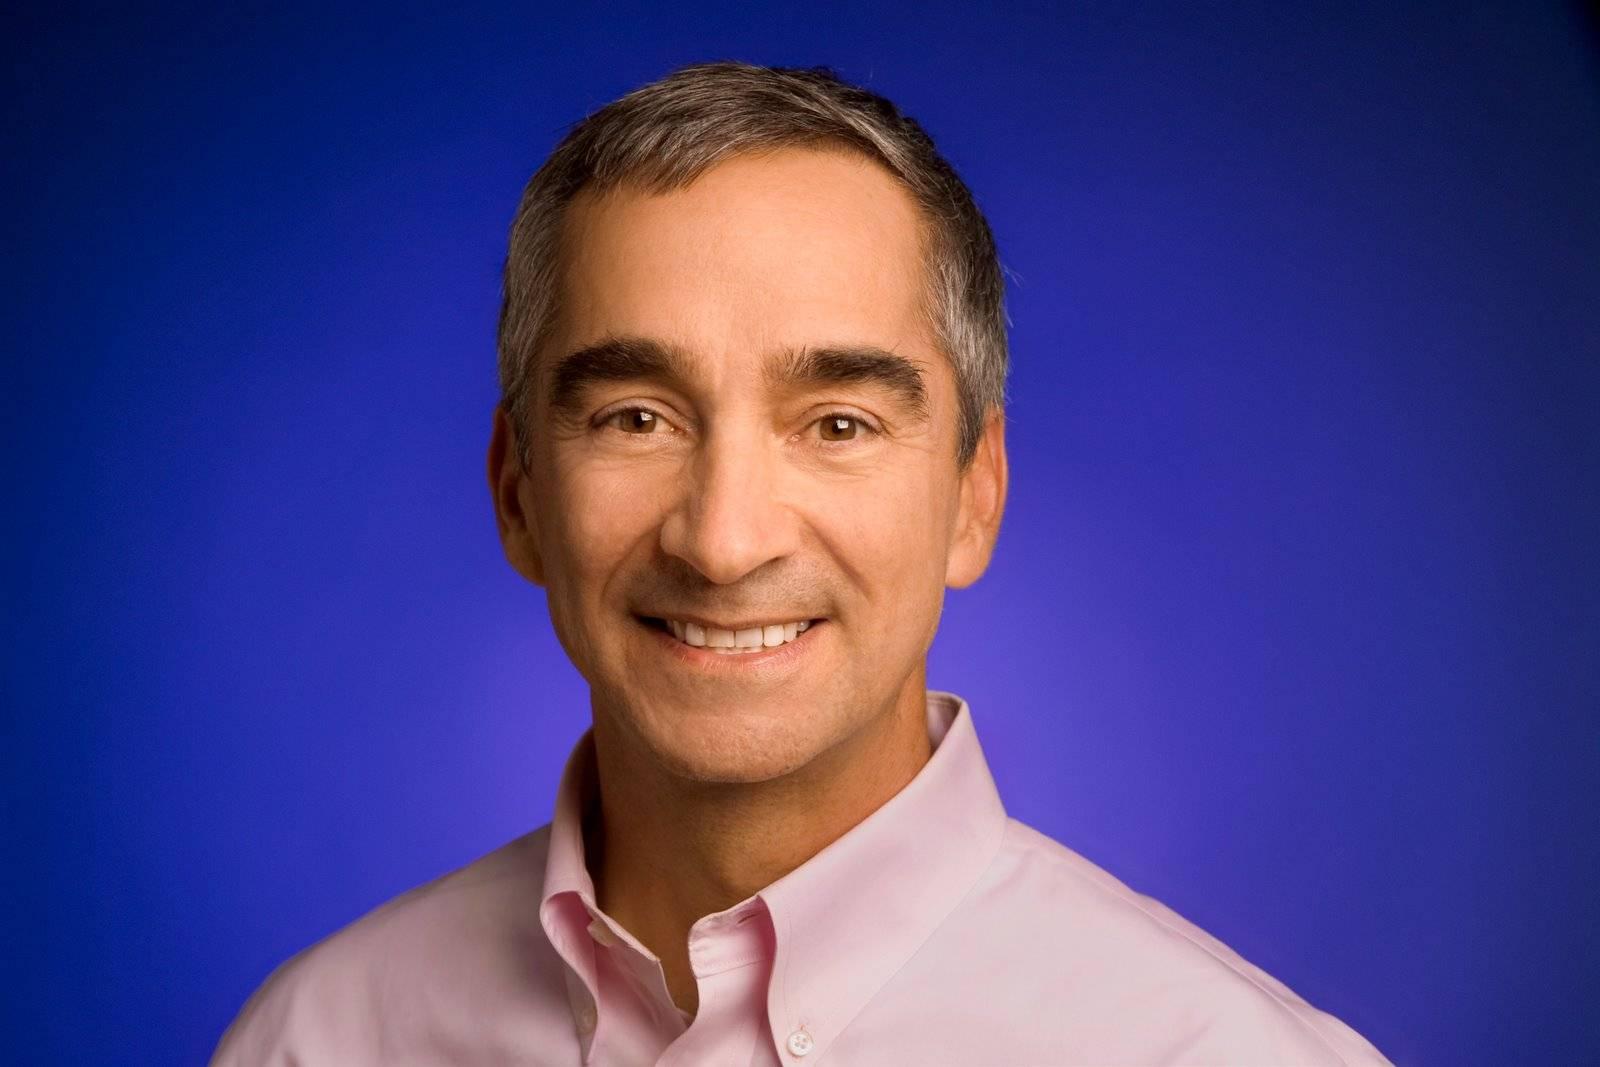 Patrick Pichette,Senior Vice President & Chief Financial Officer